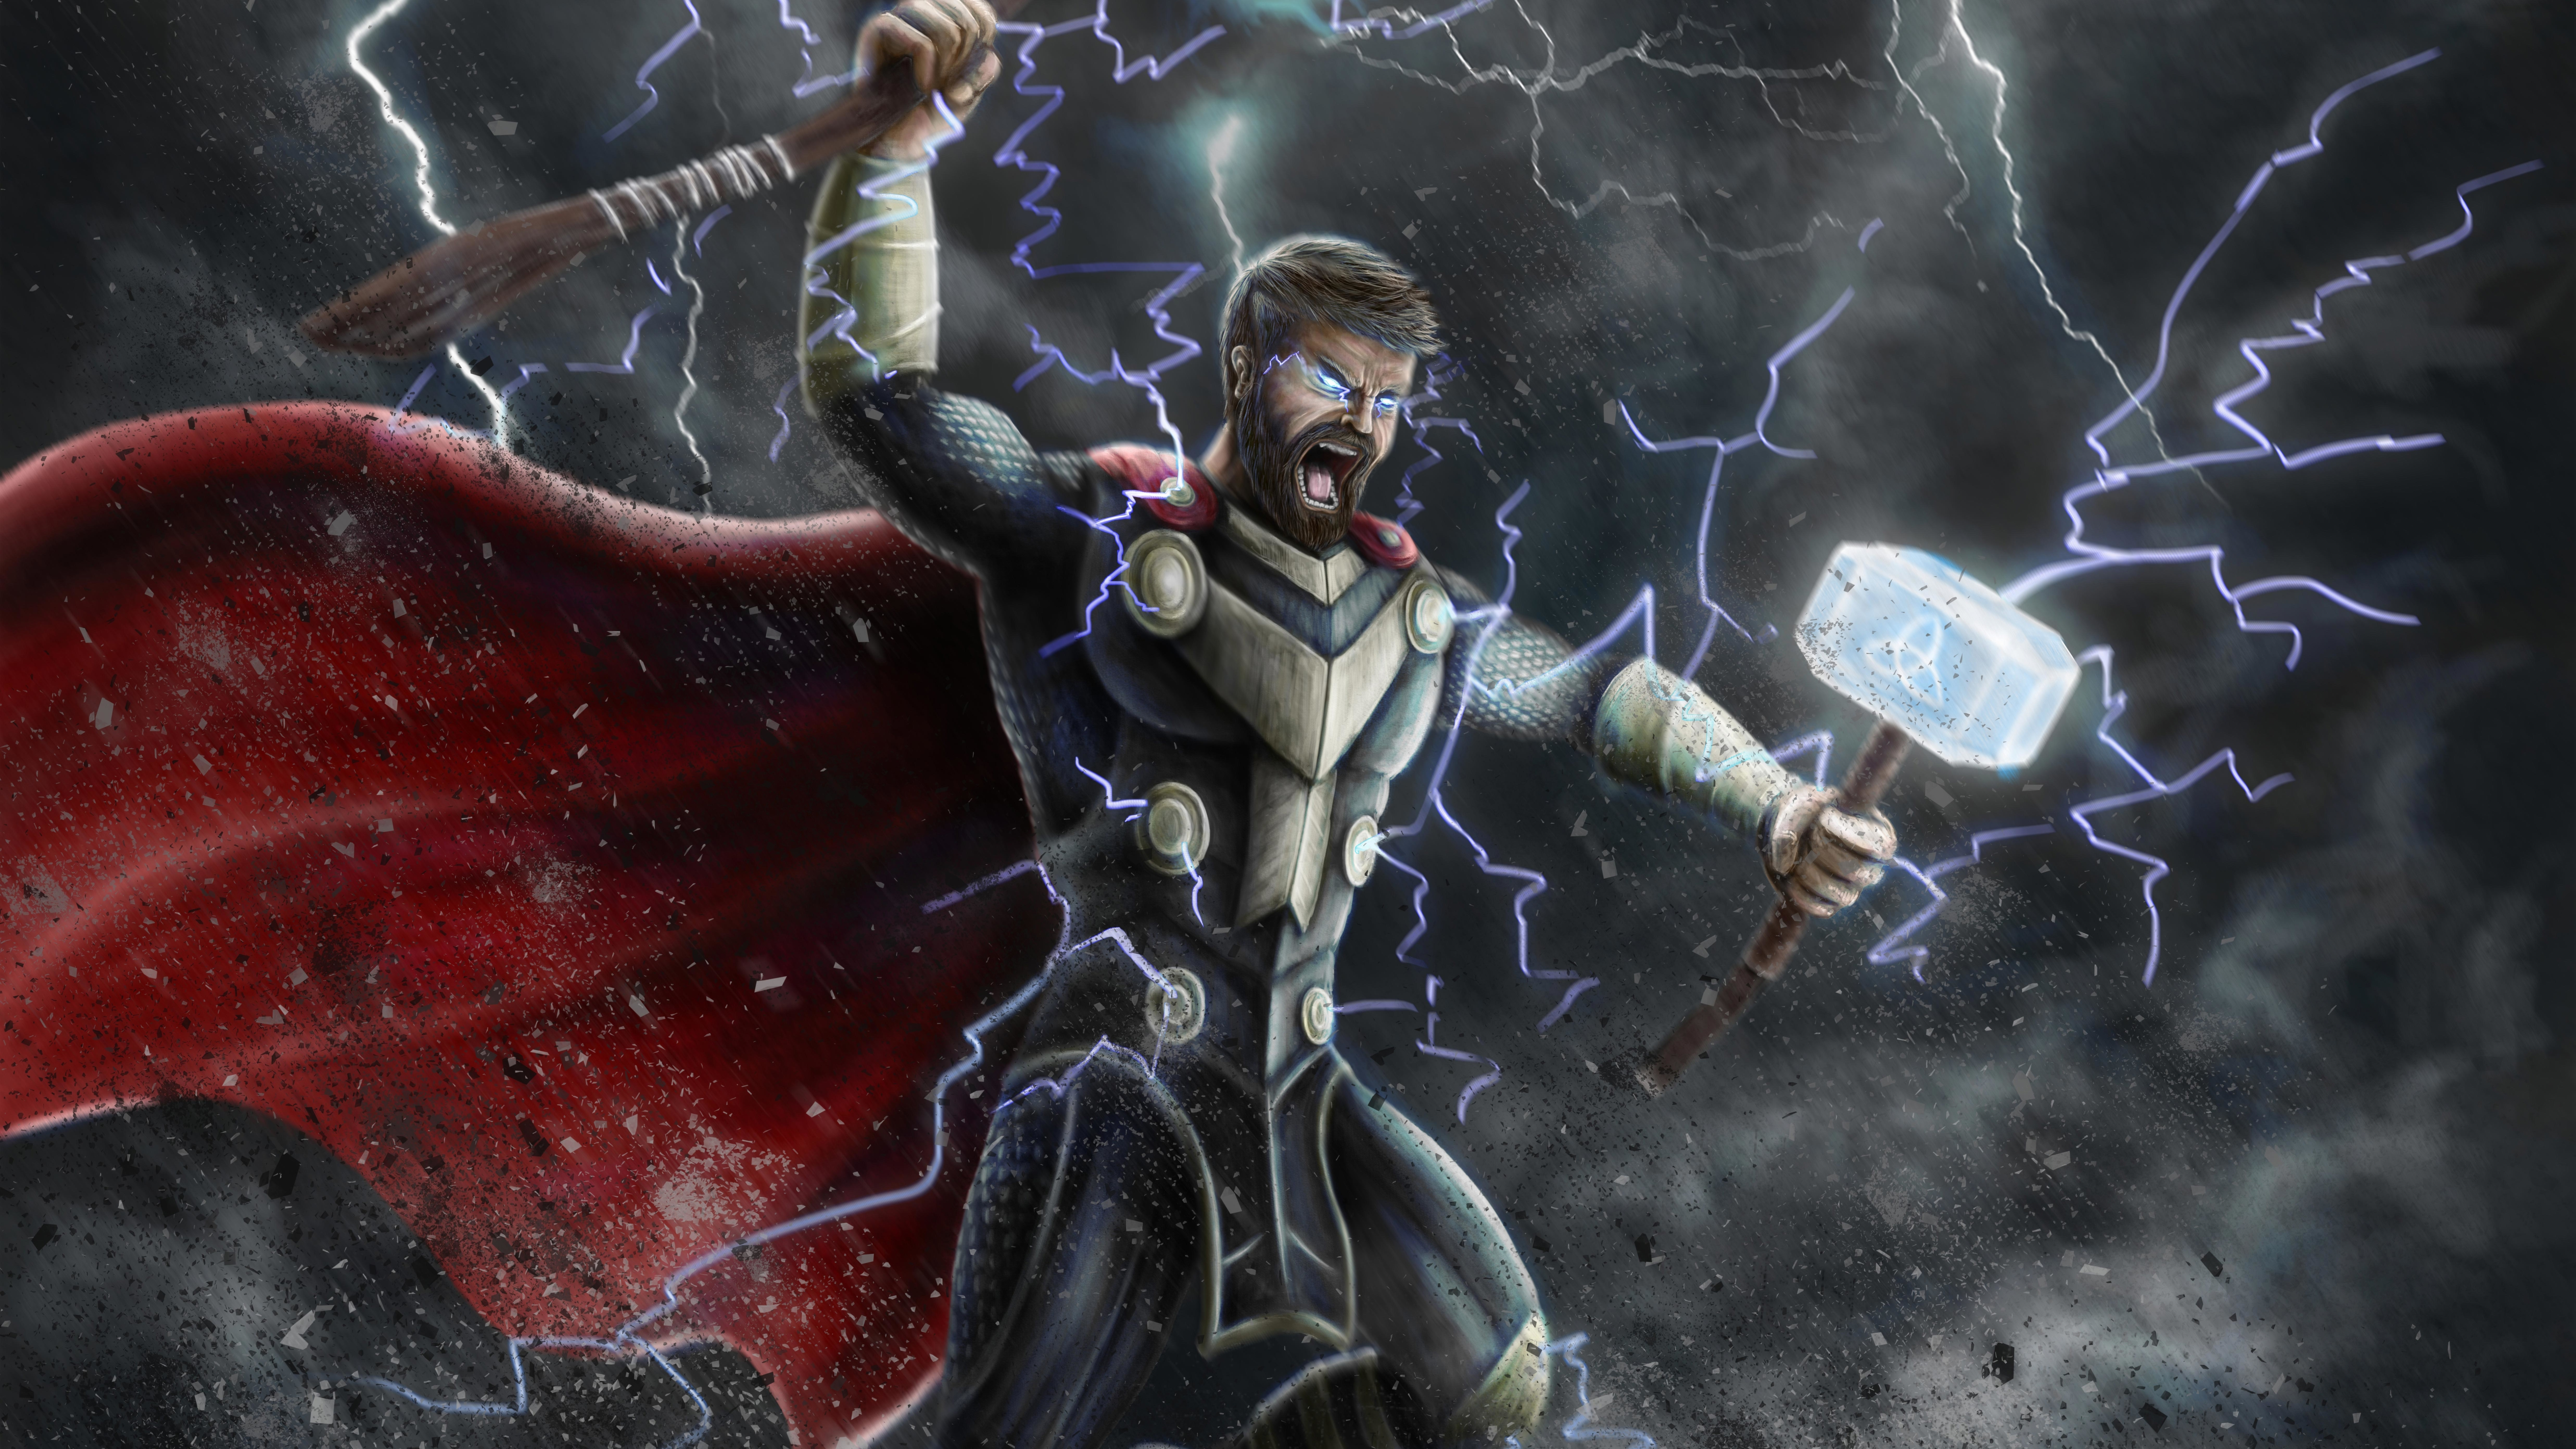 7680x4320 Thor Mcu Artwork 8k Wallpaper Hd Superheroes 4k